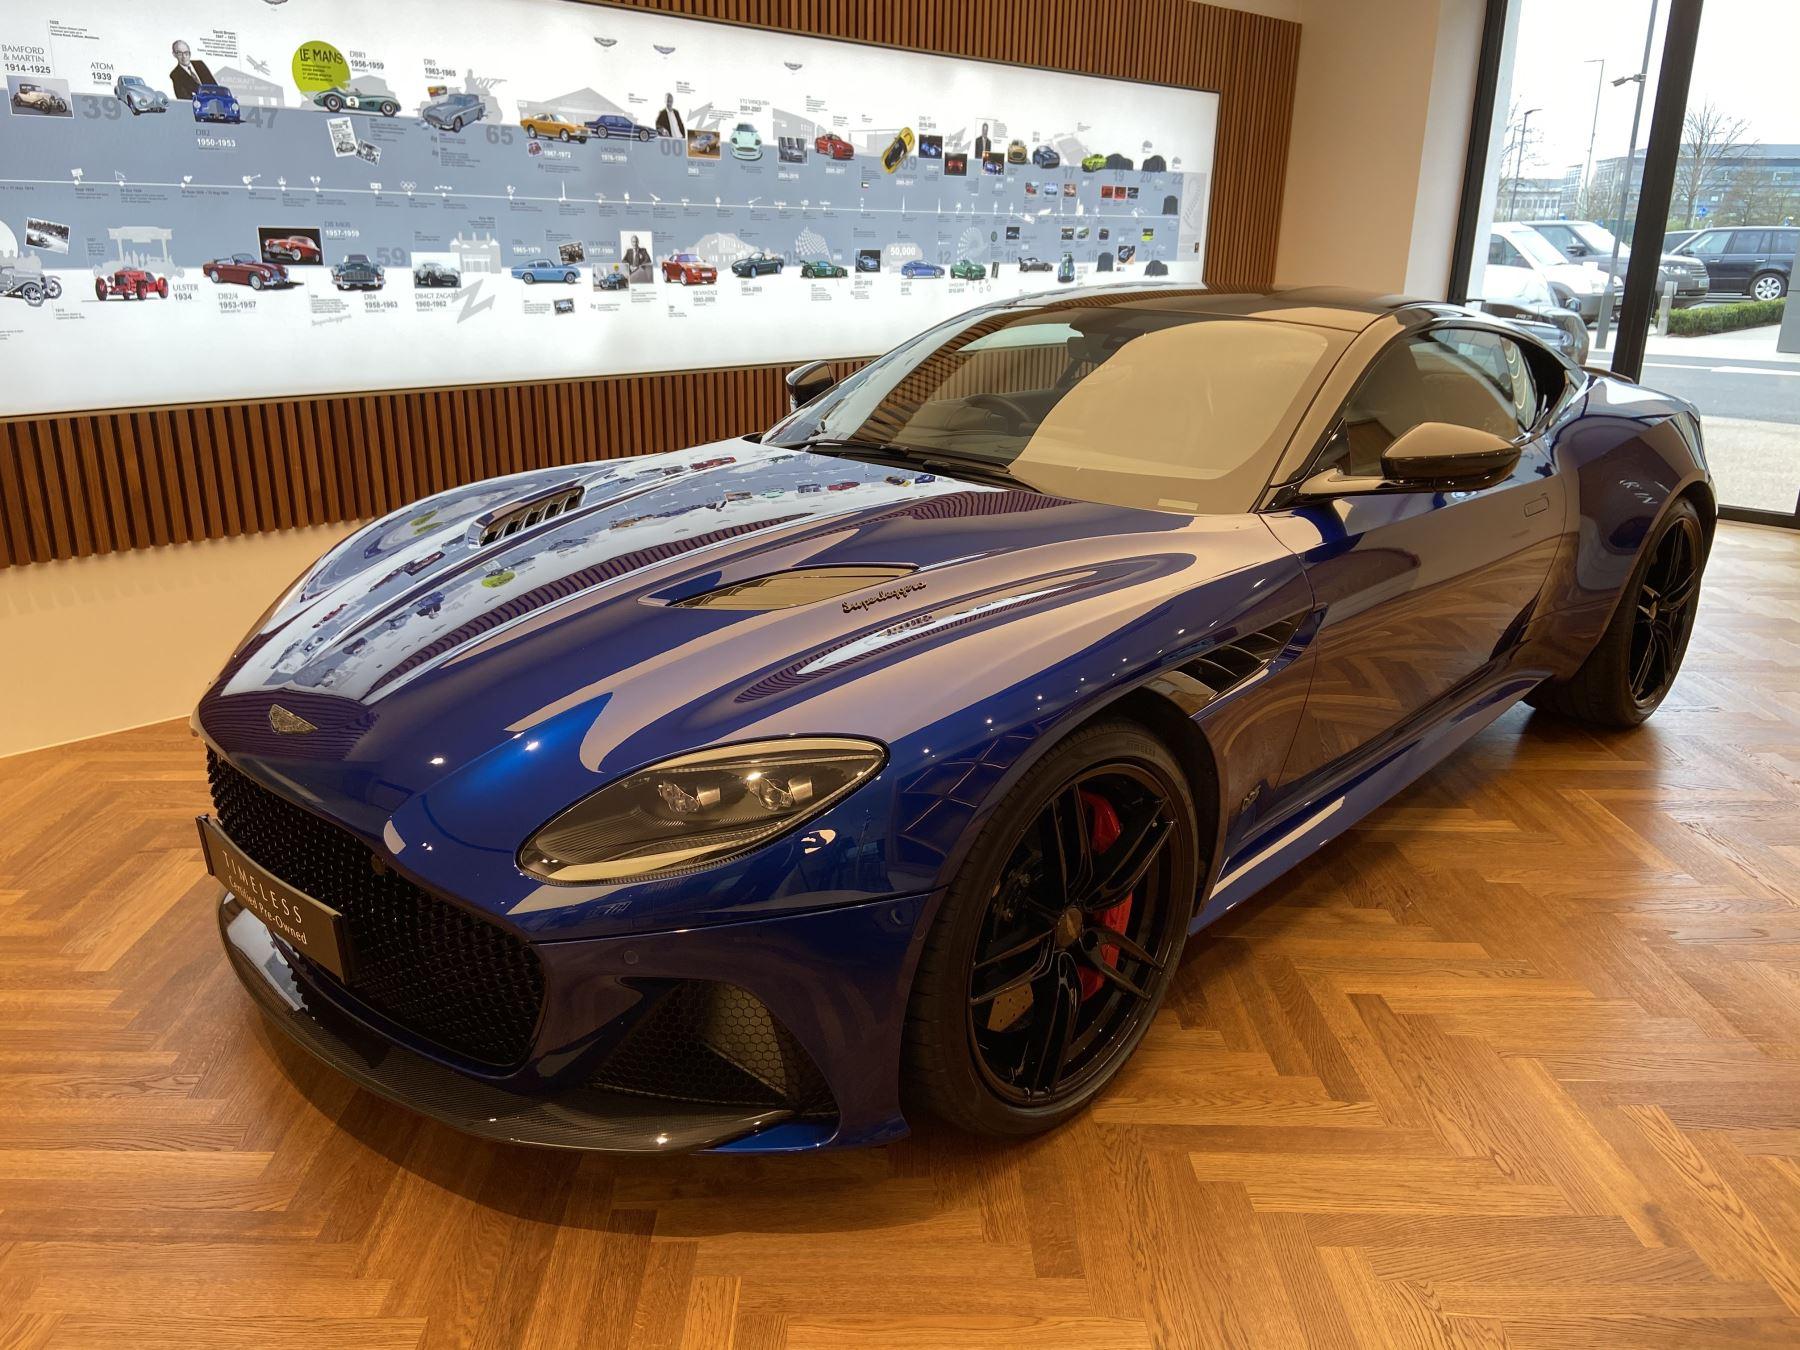 Aston Martin DBS V12 Superleggera 2dr Touchtronic image 30